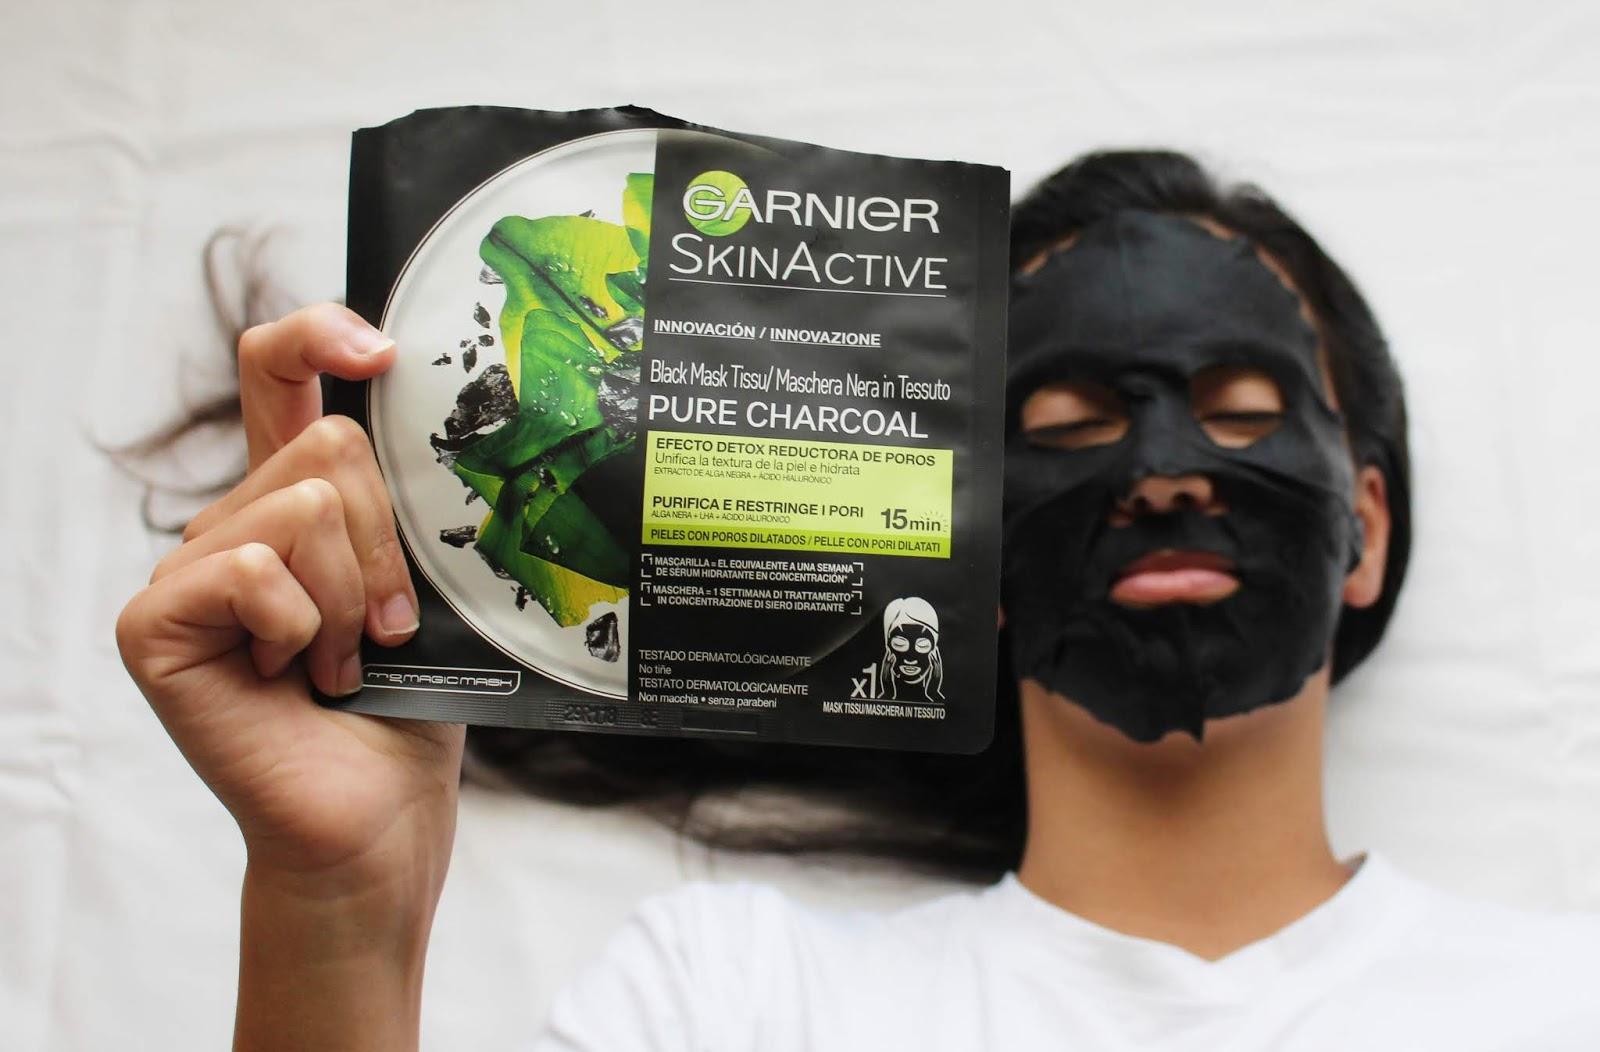 Máscara de tecido purificante hidratante da garnier